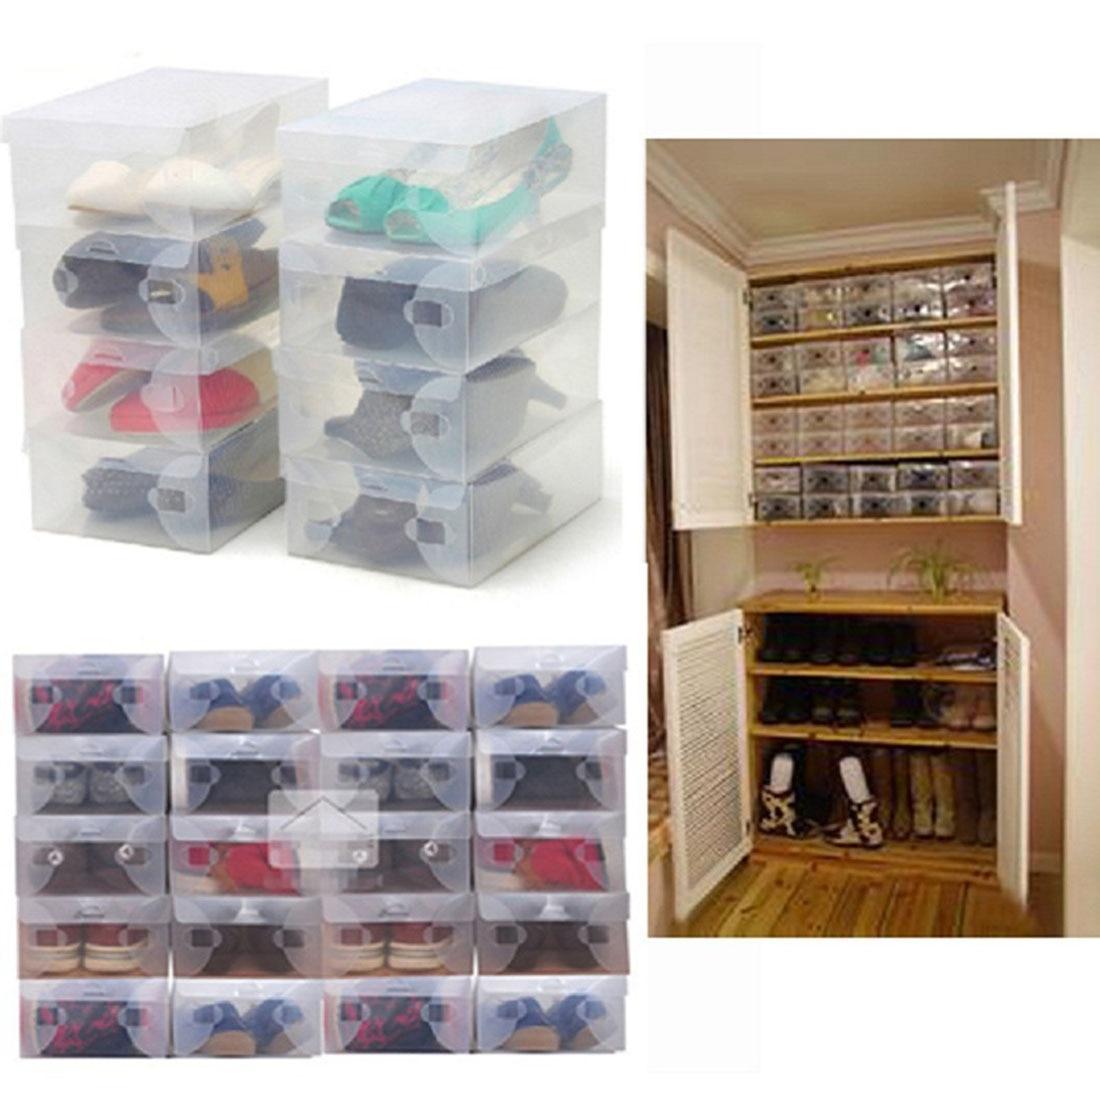 Top Sale 10Pcs Transparent Makeup Organizer Clear Plastic Shoes Storage Boxes Foldable Shoes Case Holder Home Useful Tools